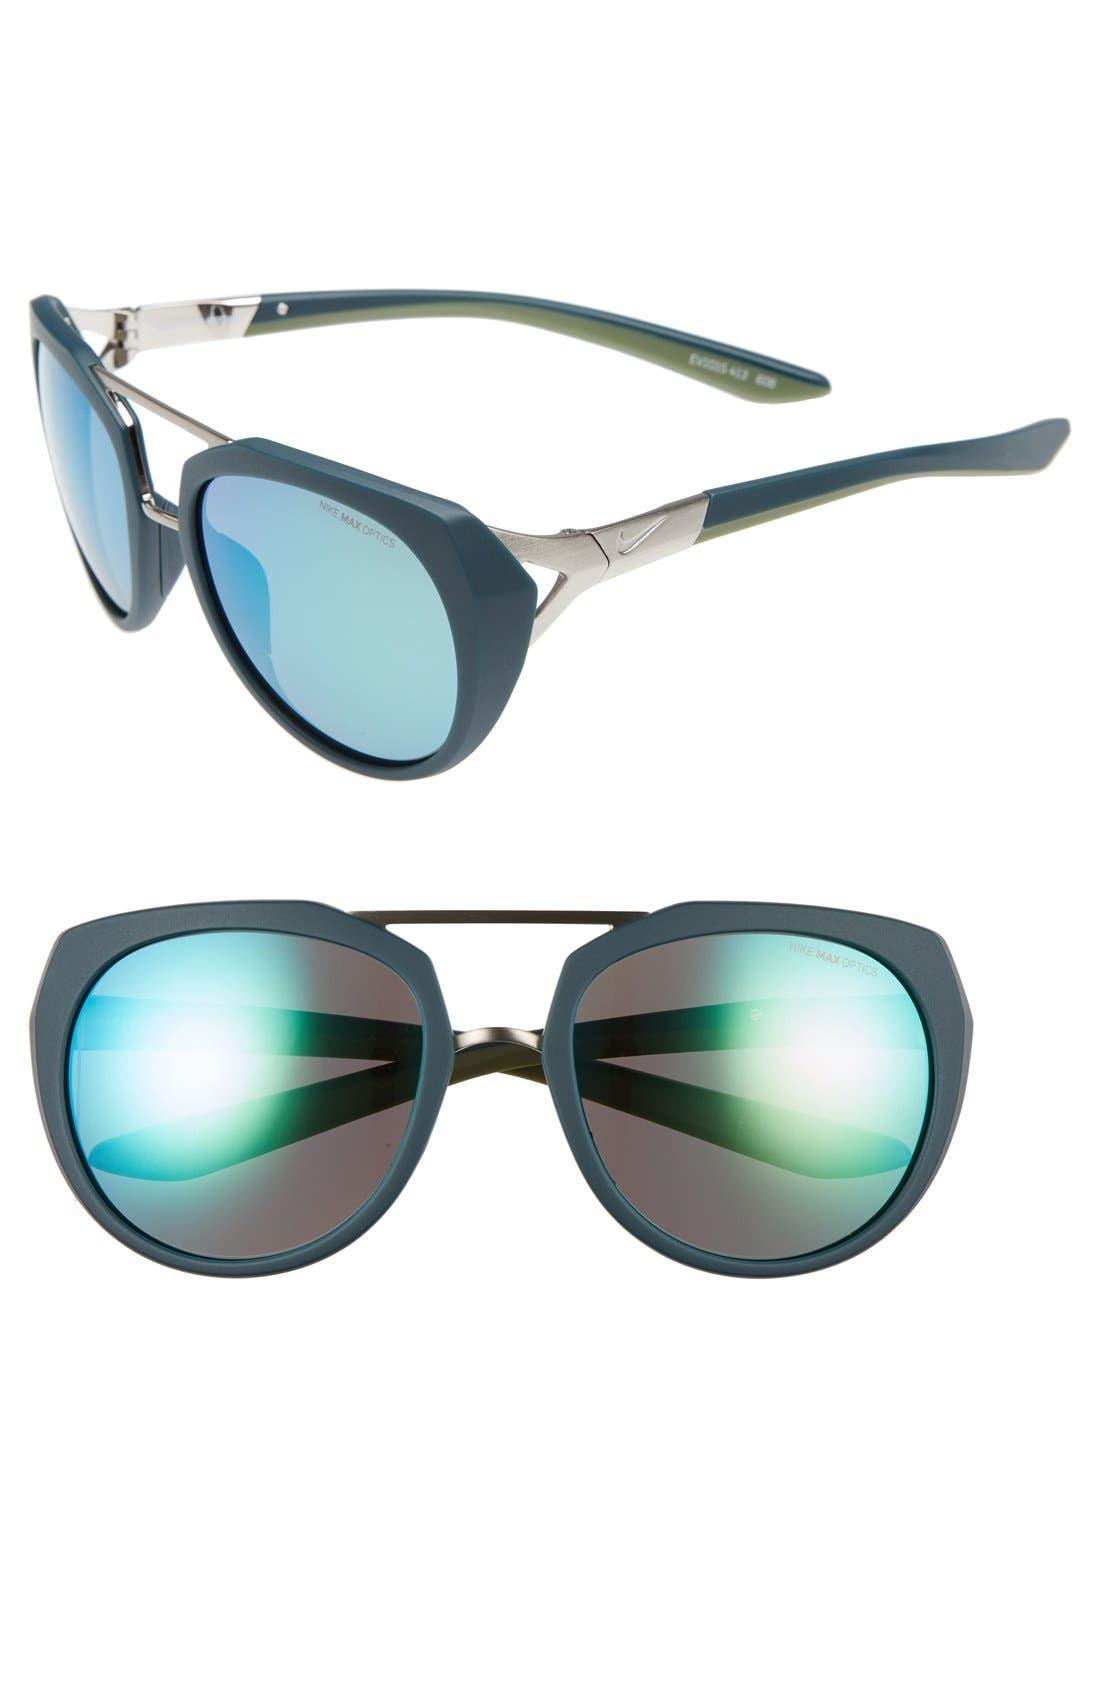 nike glasses womens blue